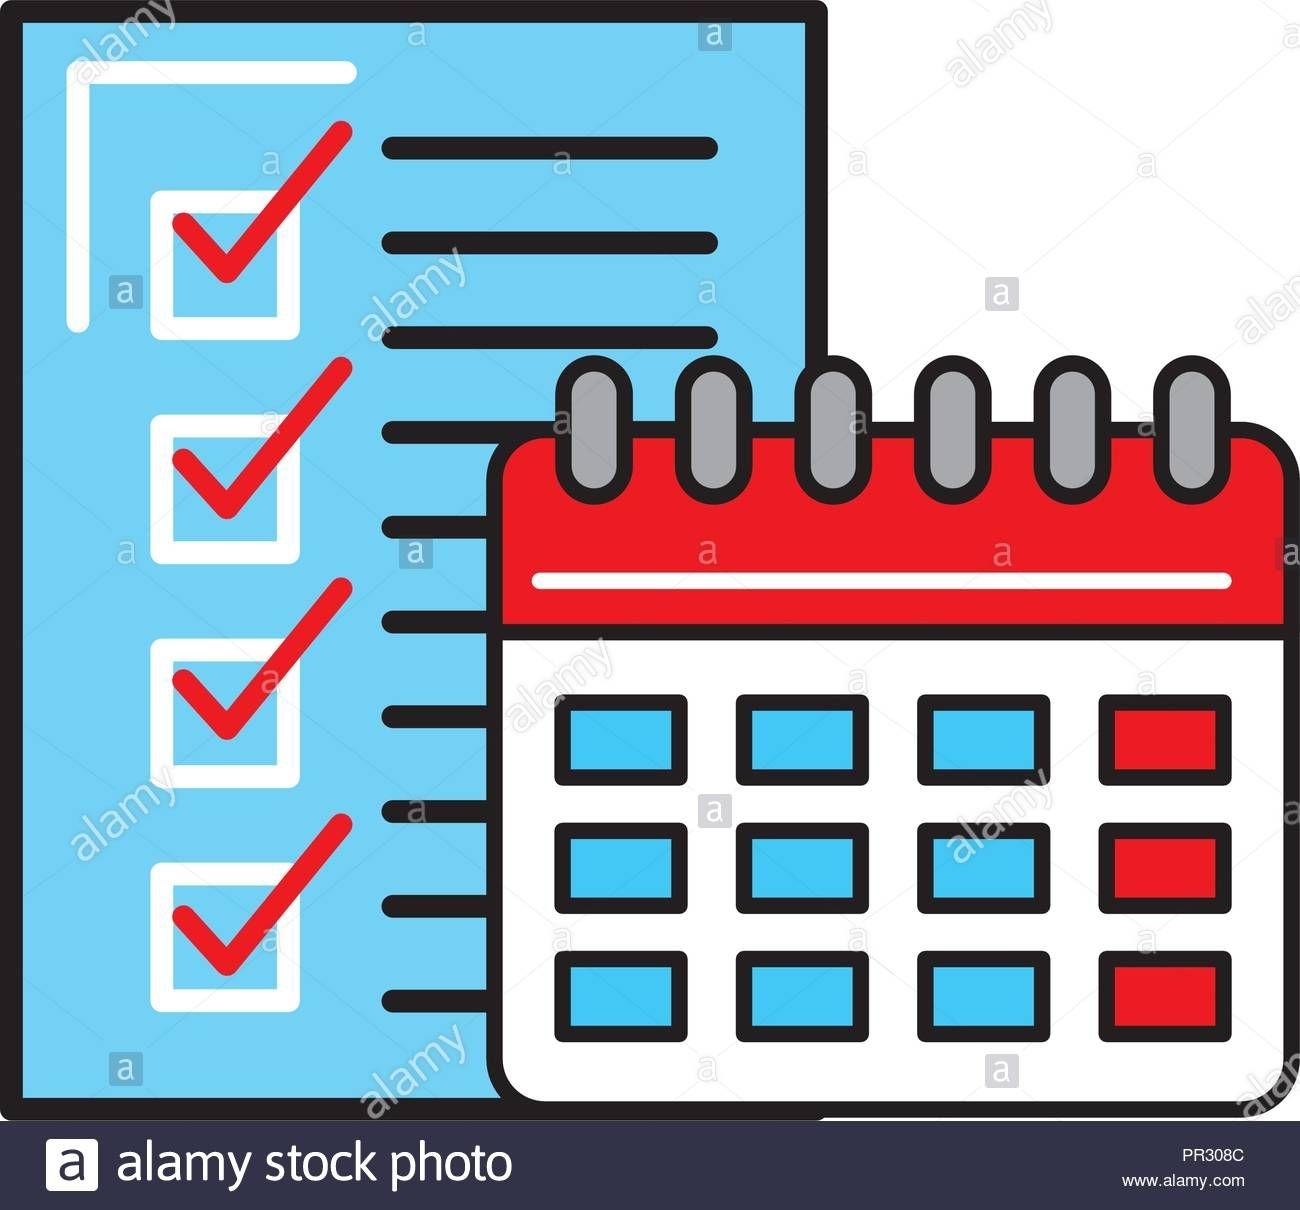 Online Shopping Logistic Calendar Checklist Stock Vector